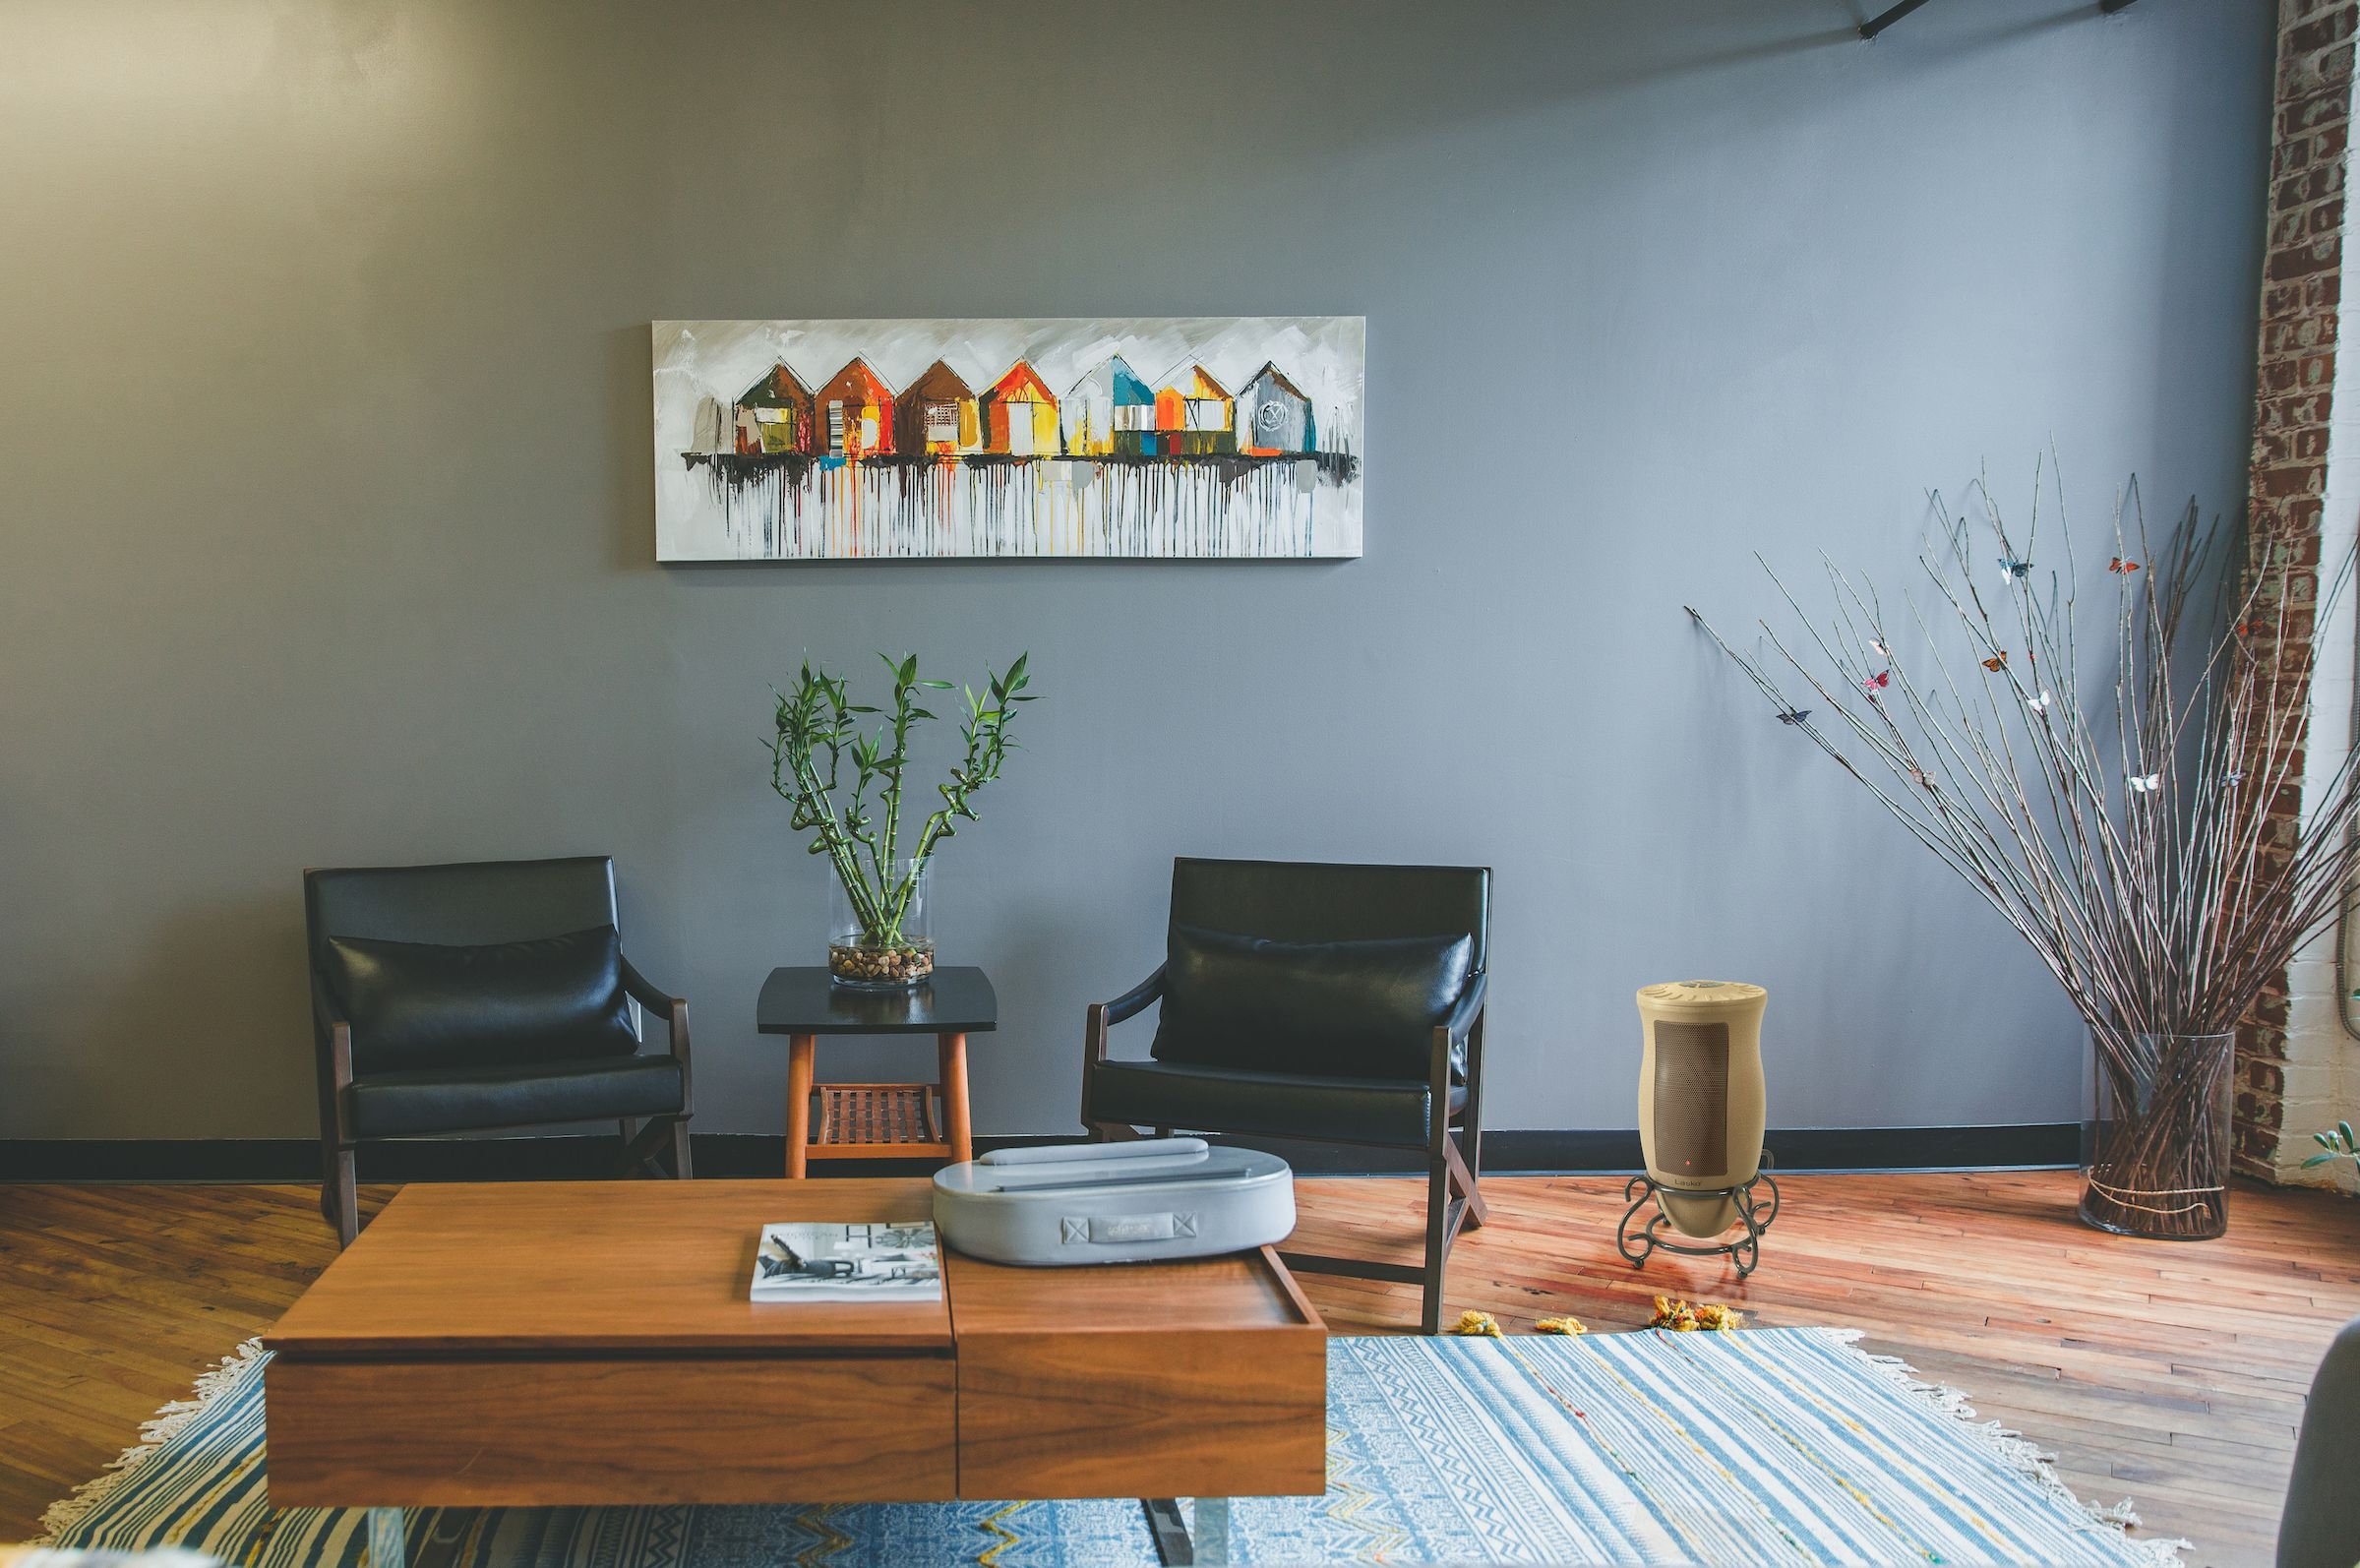 The 25 Best Space Heaters Of 2020 In 2020 Comfy Living Room Best Space Heater Lasko